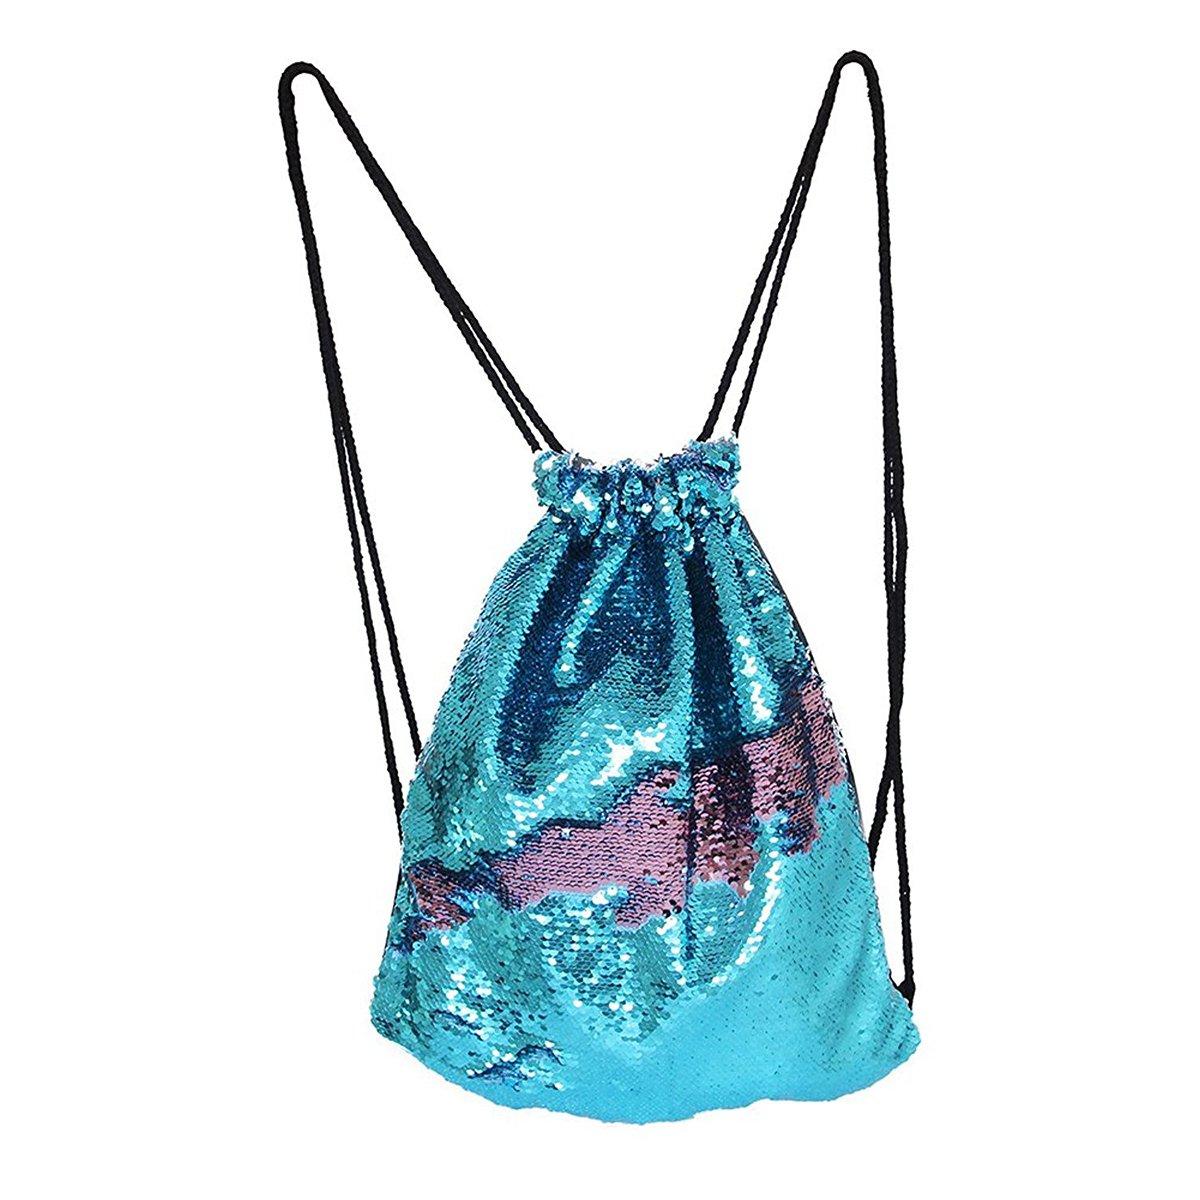 Xy Litol Drawstring Backpack, Gym Cinch Sack Sport Bag for Men & Women School Yoga Travel Shopping Blue Pink